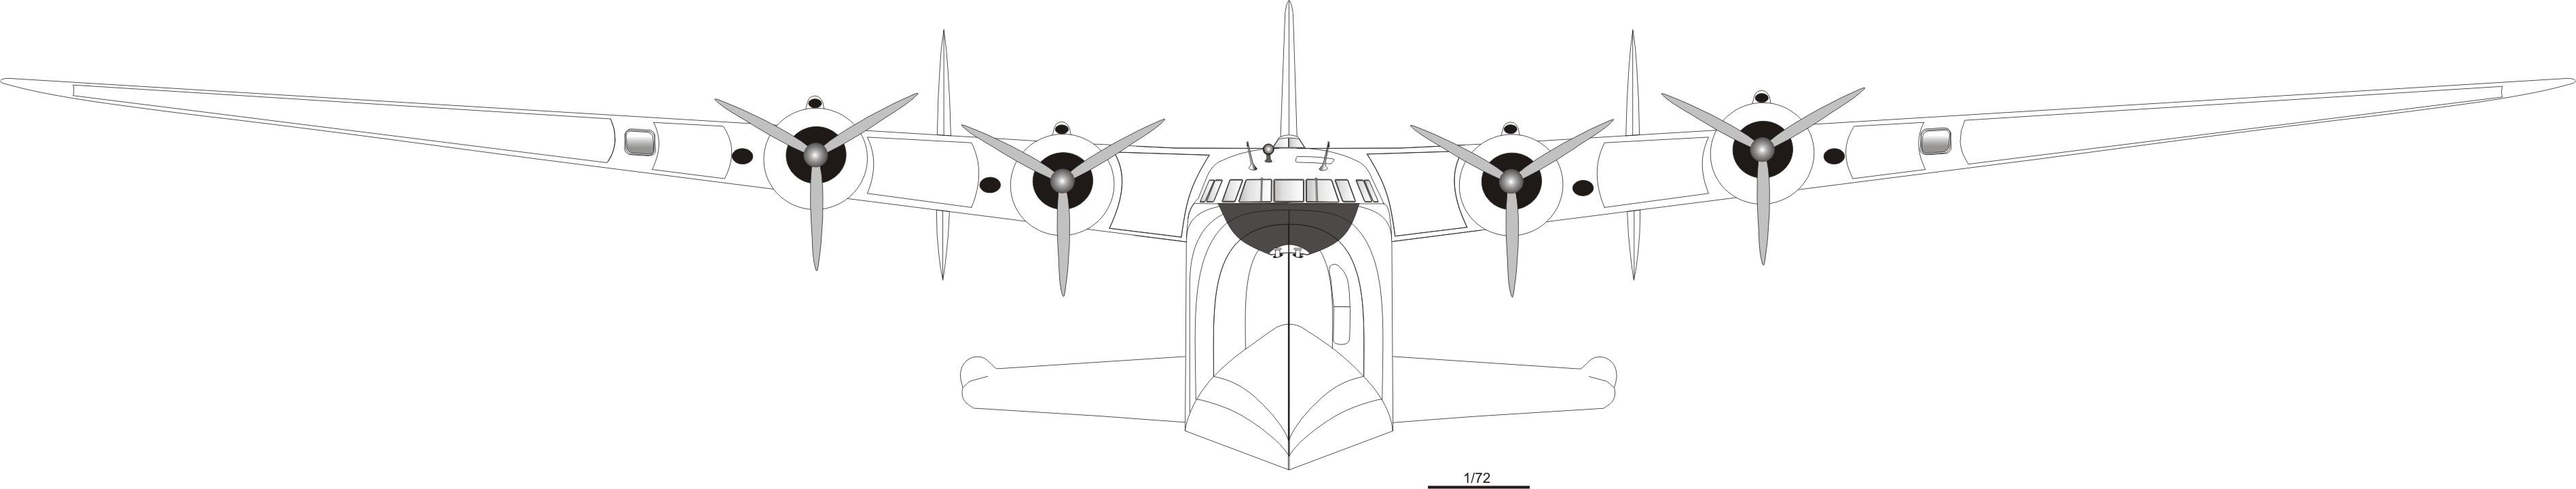 Boeing 314 blueprint